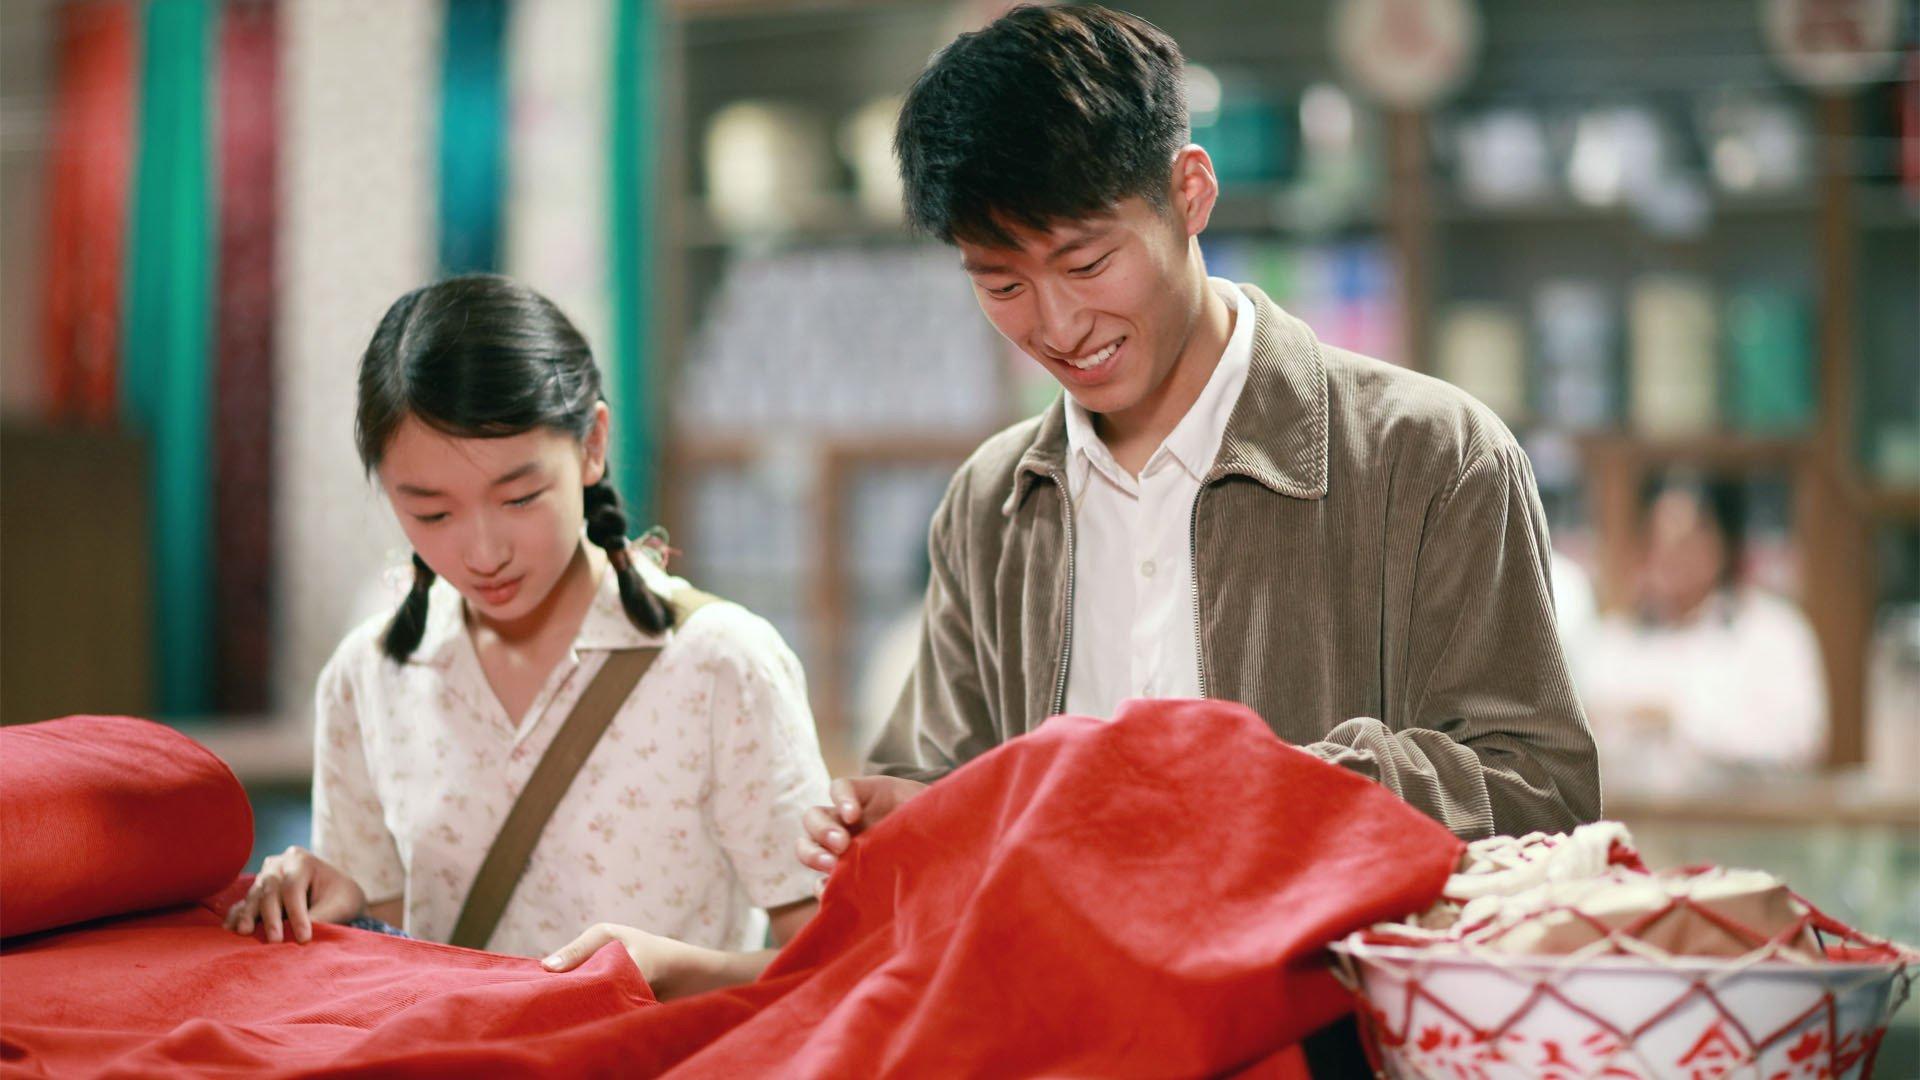 Amor bajo el espino blanco (2010), de Zhang Yimou